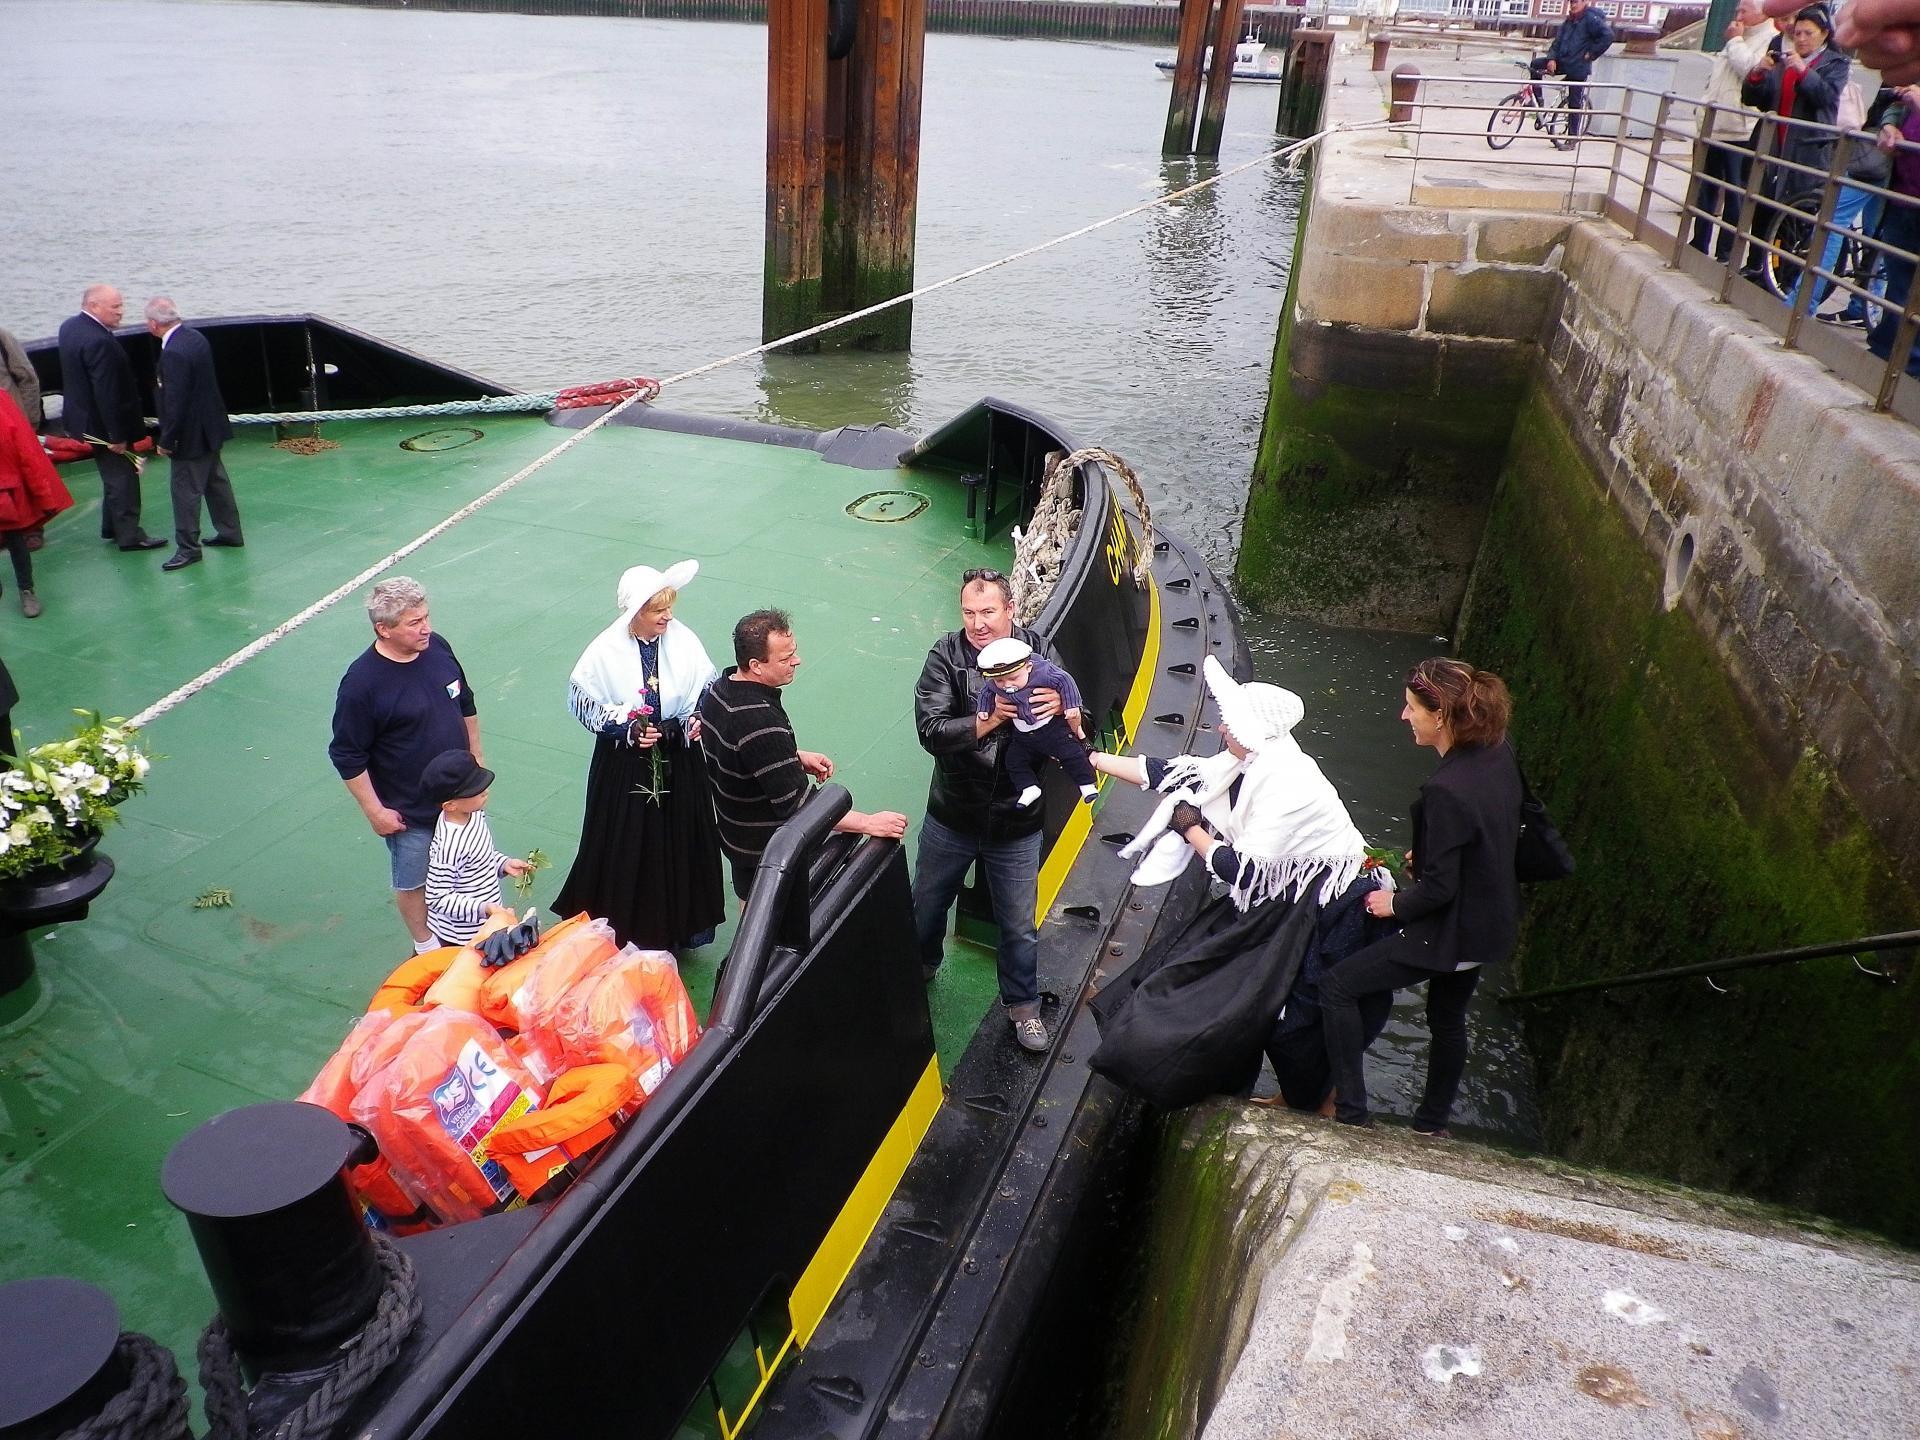 Calais benediction de la mer la descente des escaliers a calais